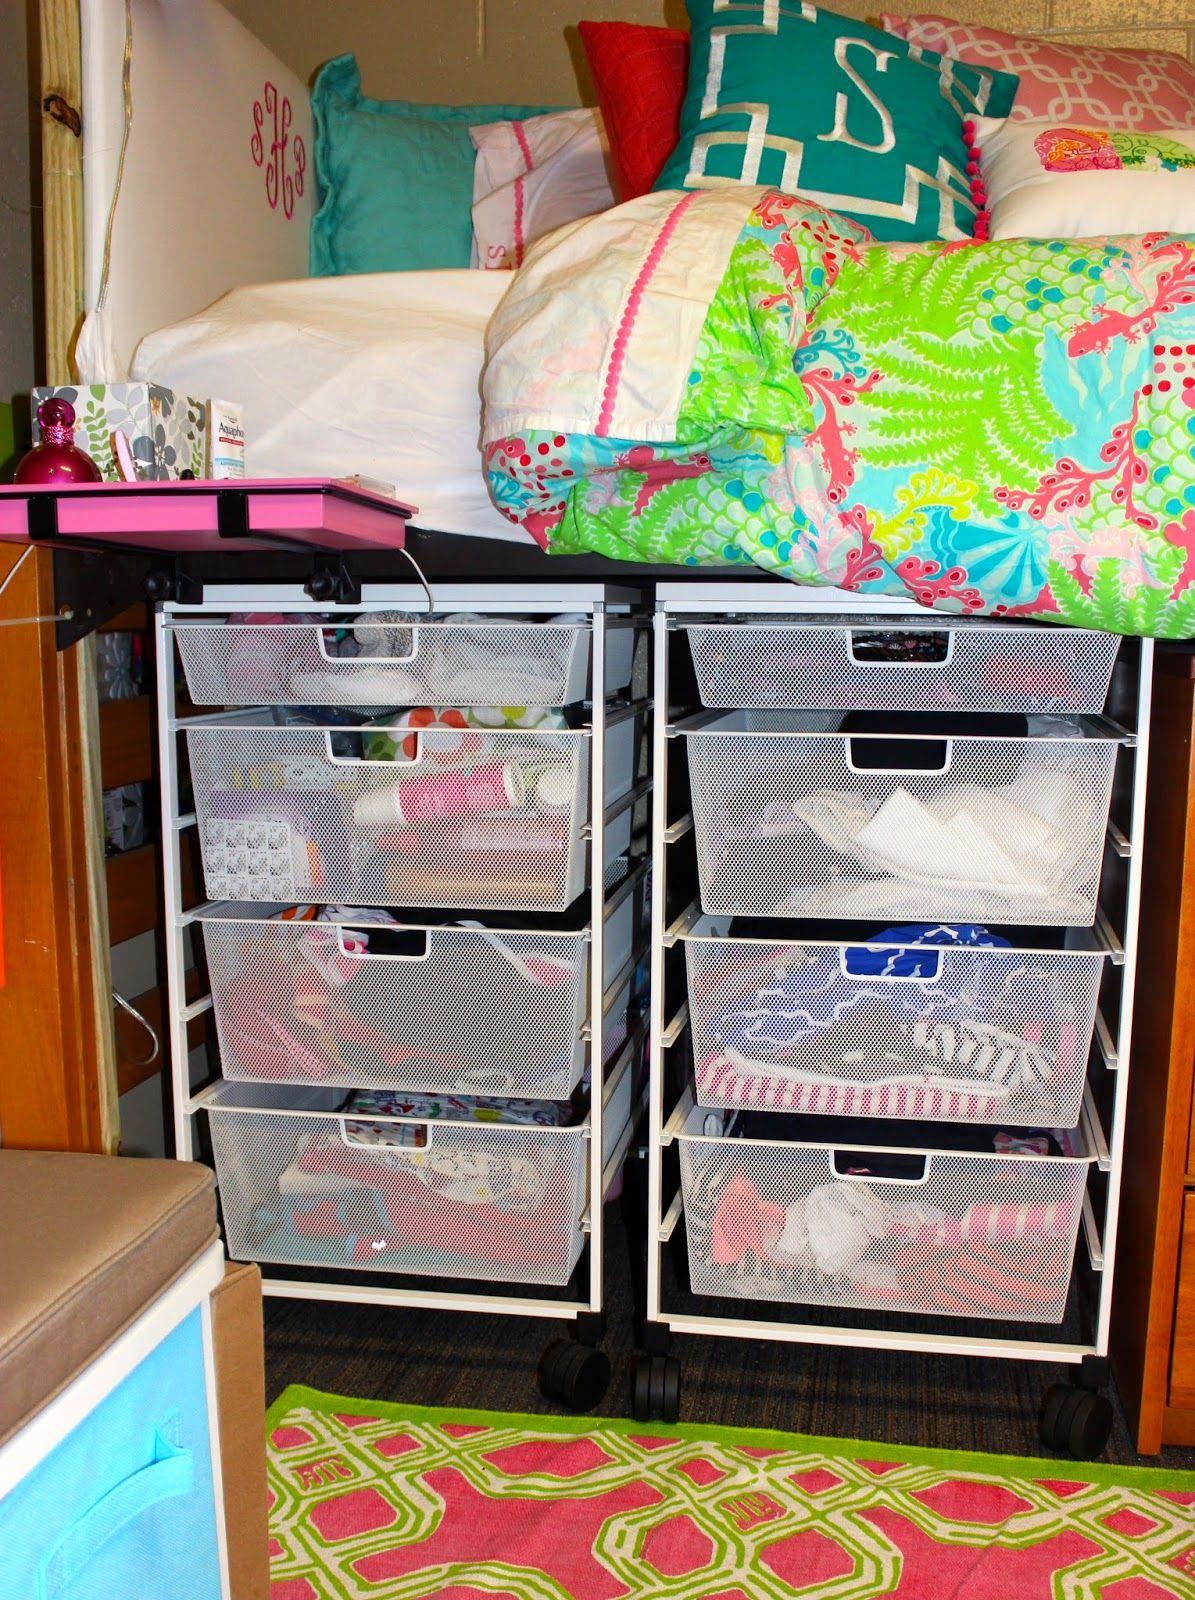 Prep avenue dorm room essentials dorm pinterest - College dorm storage ideas ...